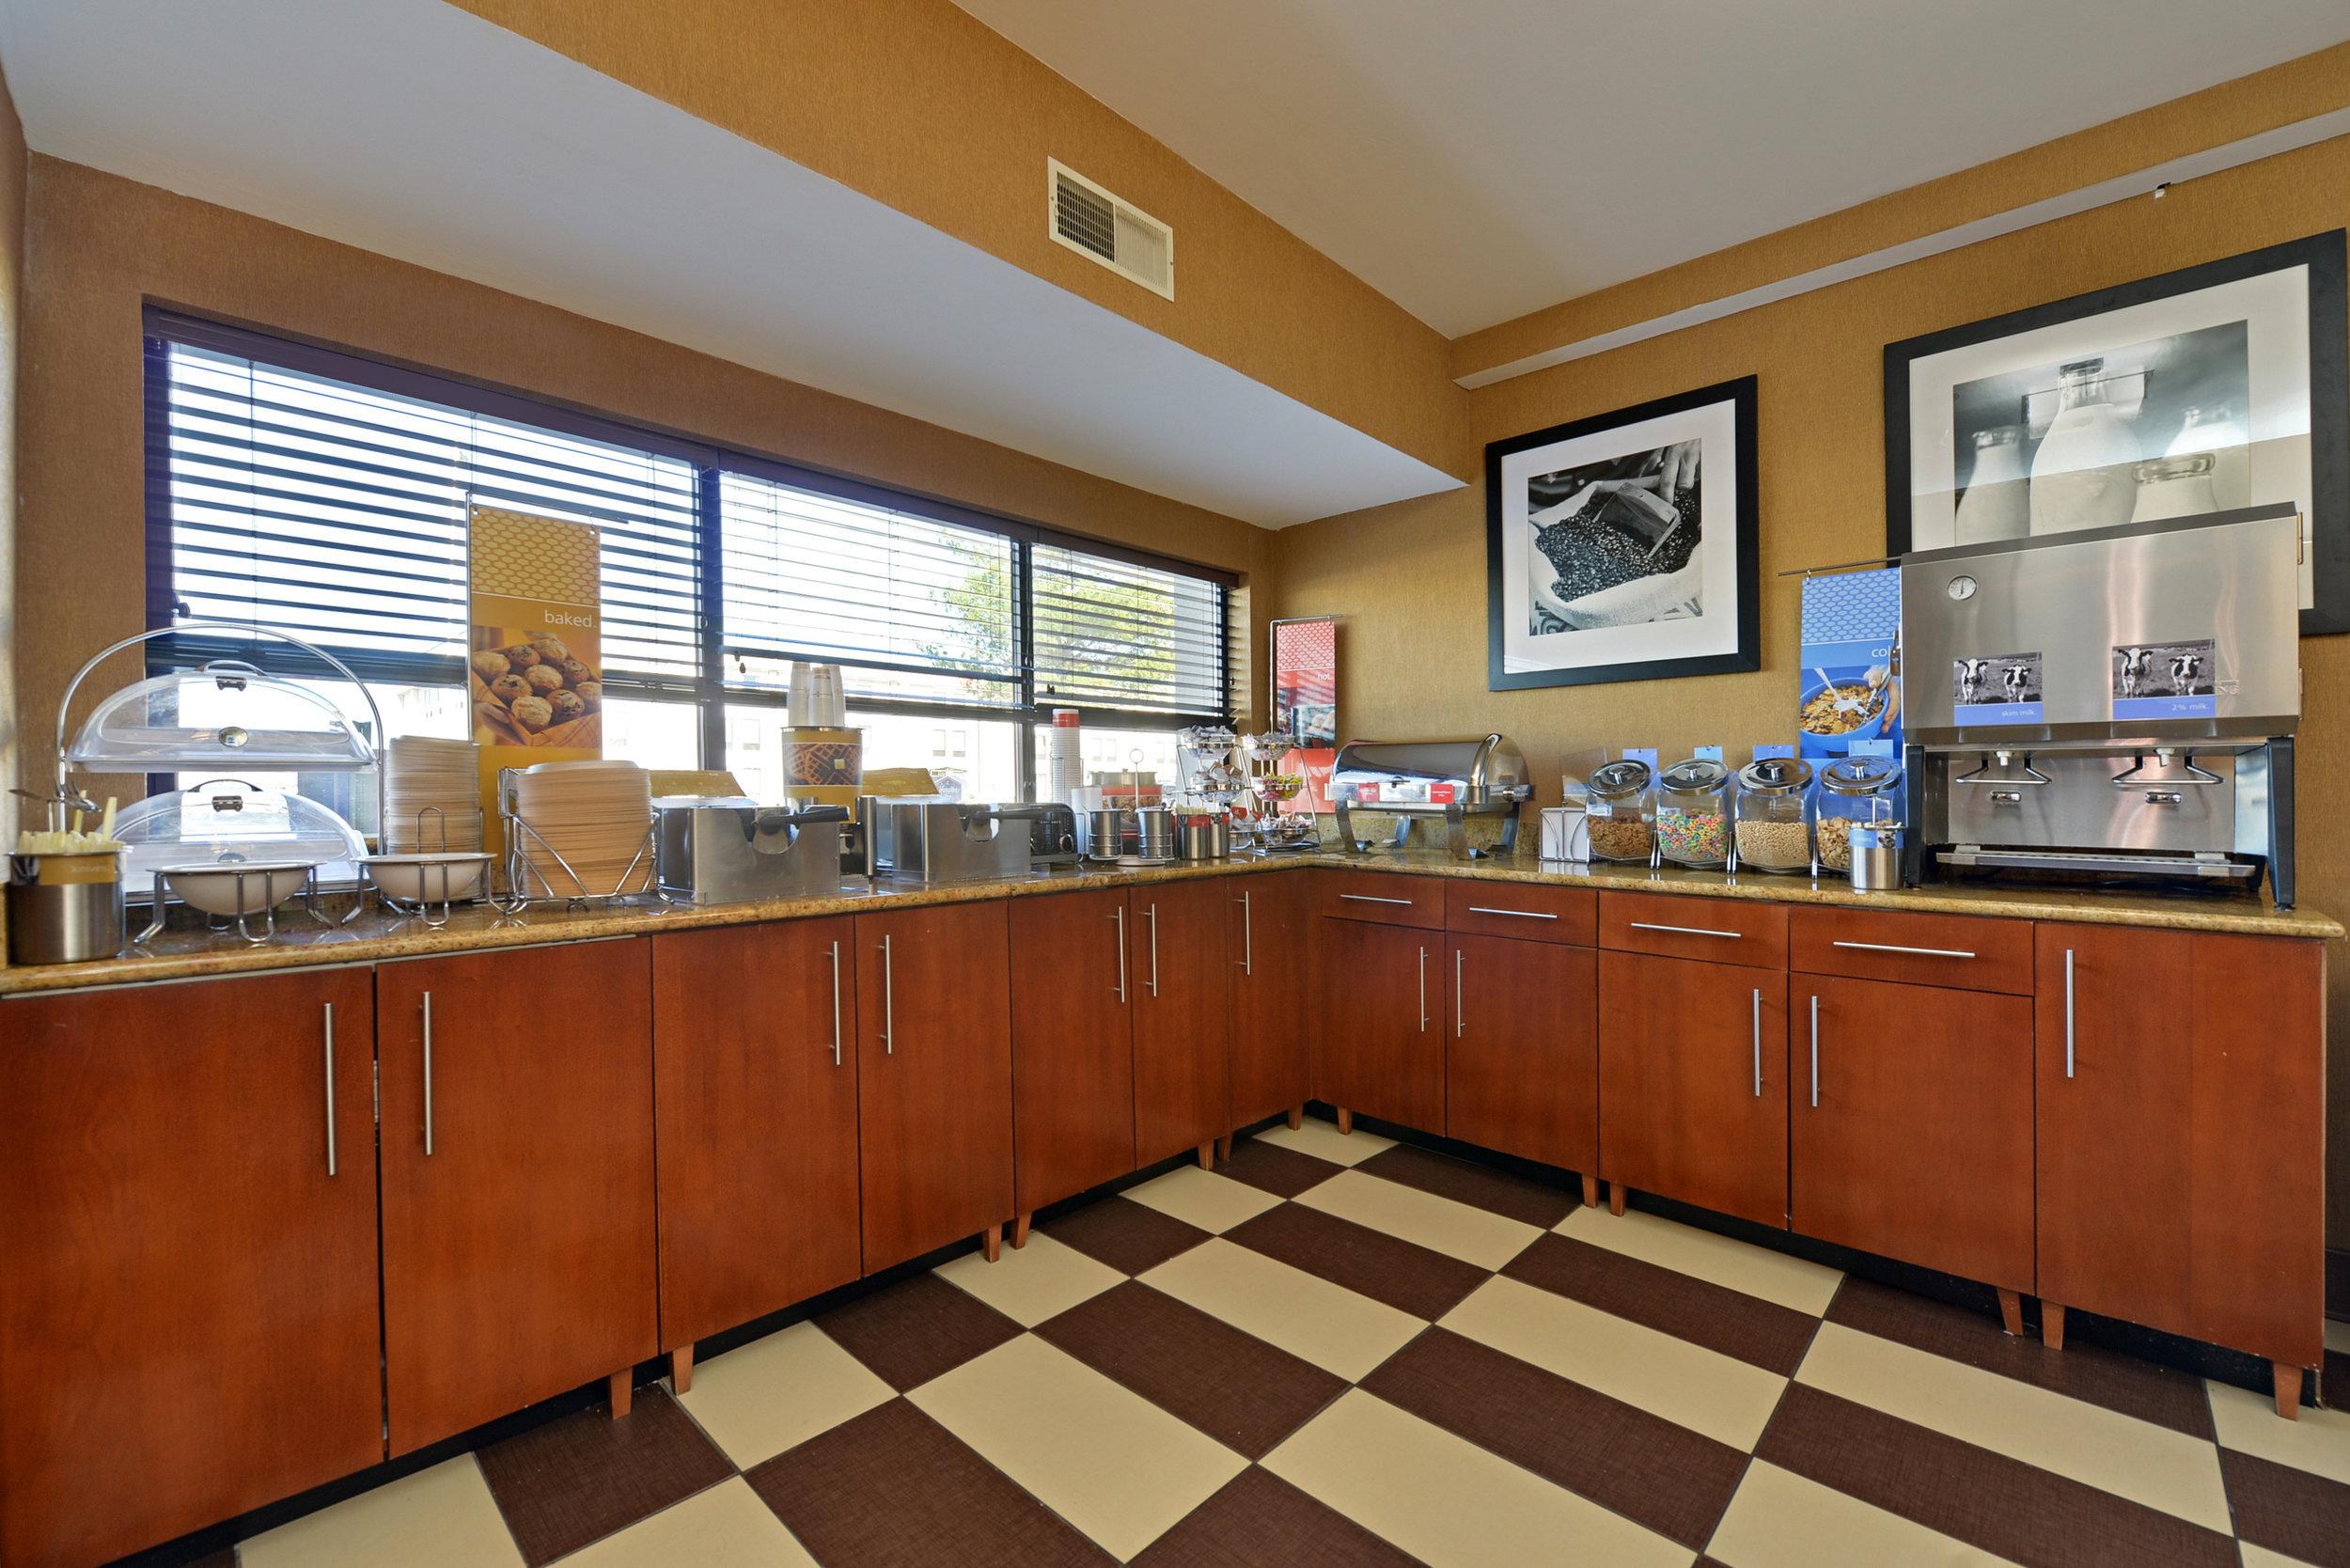 Hampton inn breakfast room.jpg